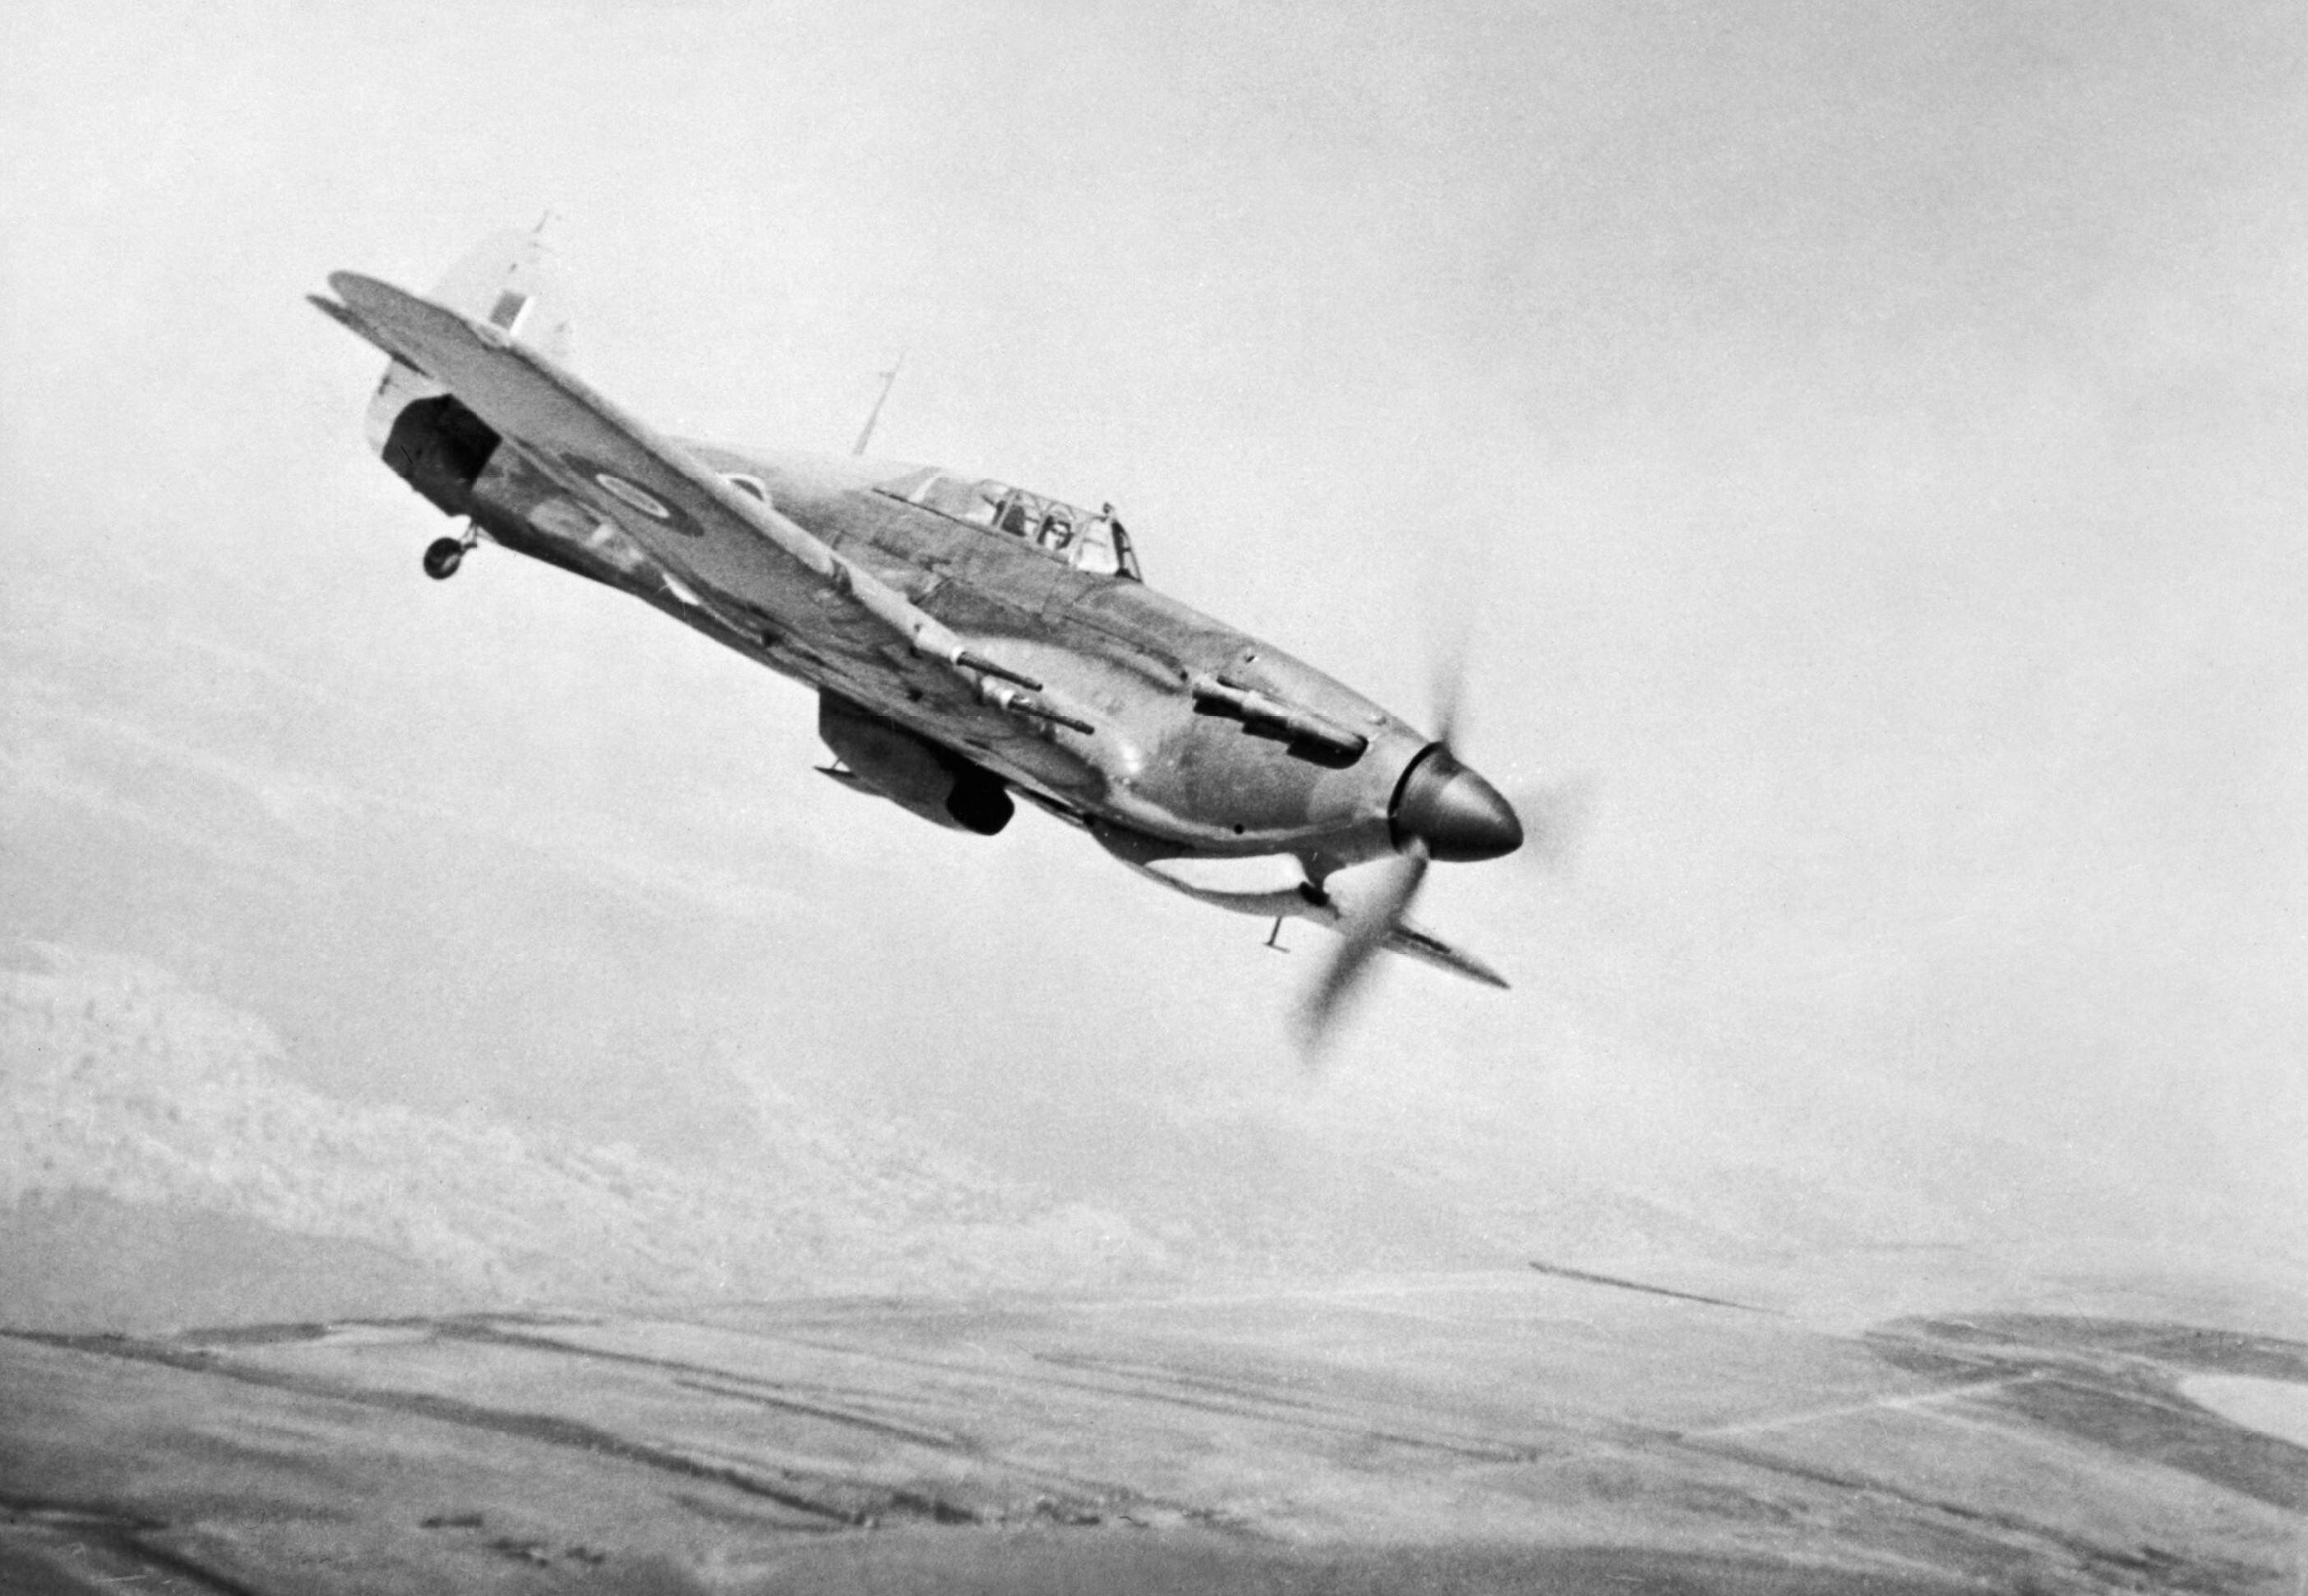 Hurricane IIc RAF 166 Wing in flight from Chittagong in India May 1943 IWM CI191